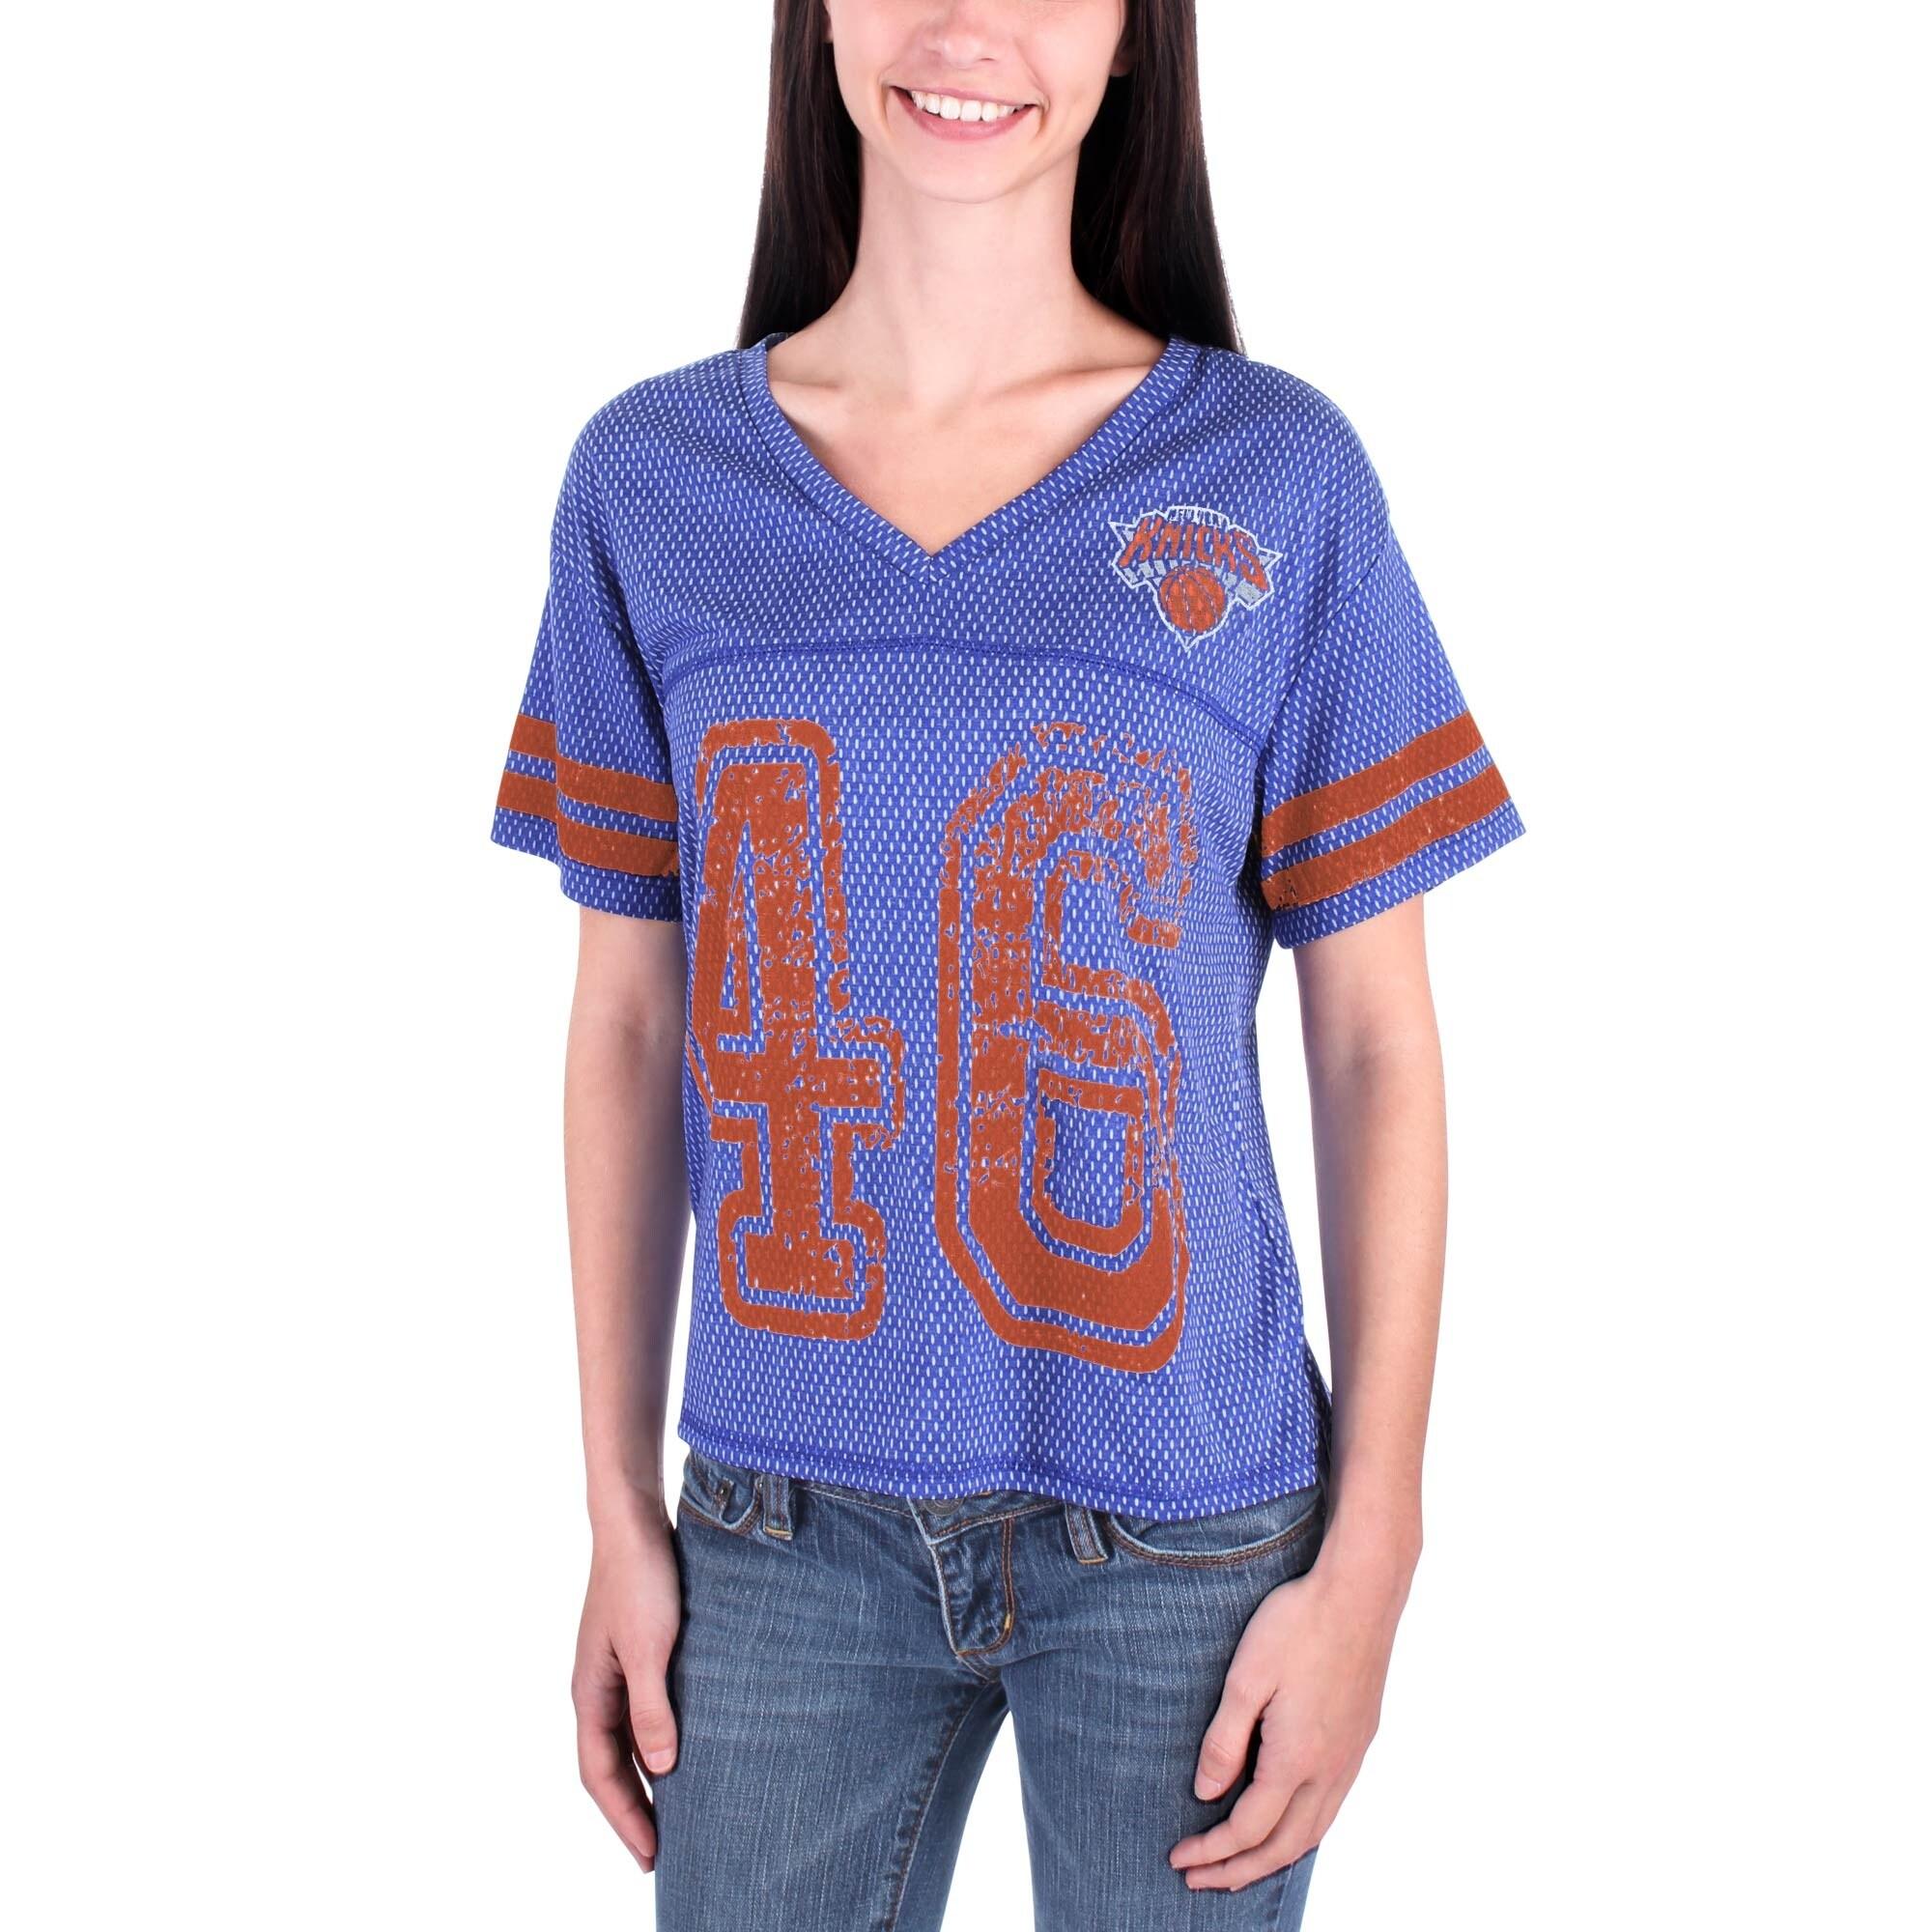 New York Knicks Women's End Zone V-Neck Jersey T-Shirt - Royal Blue